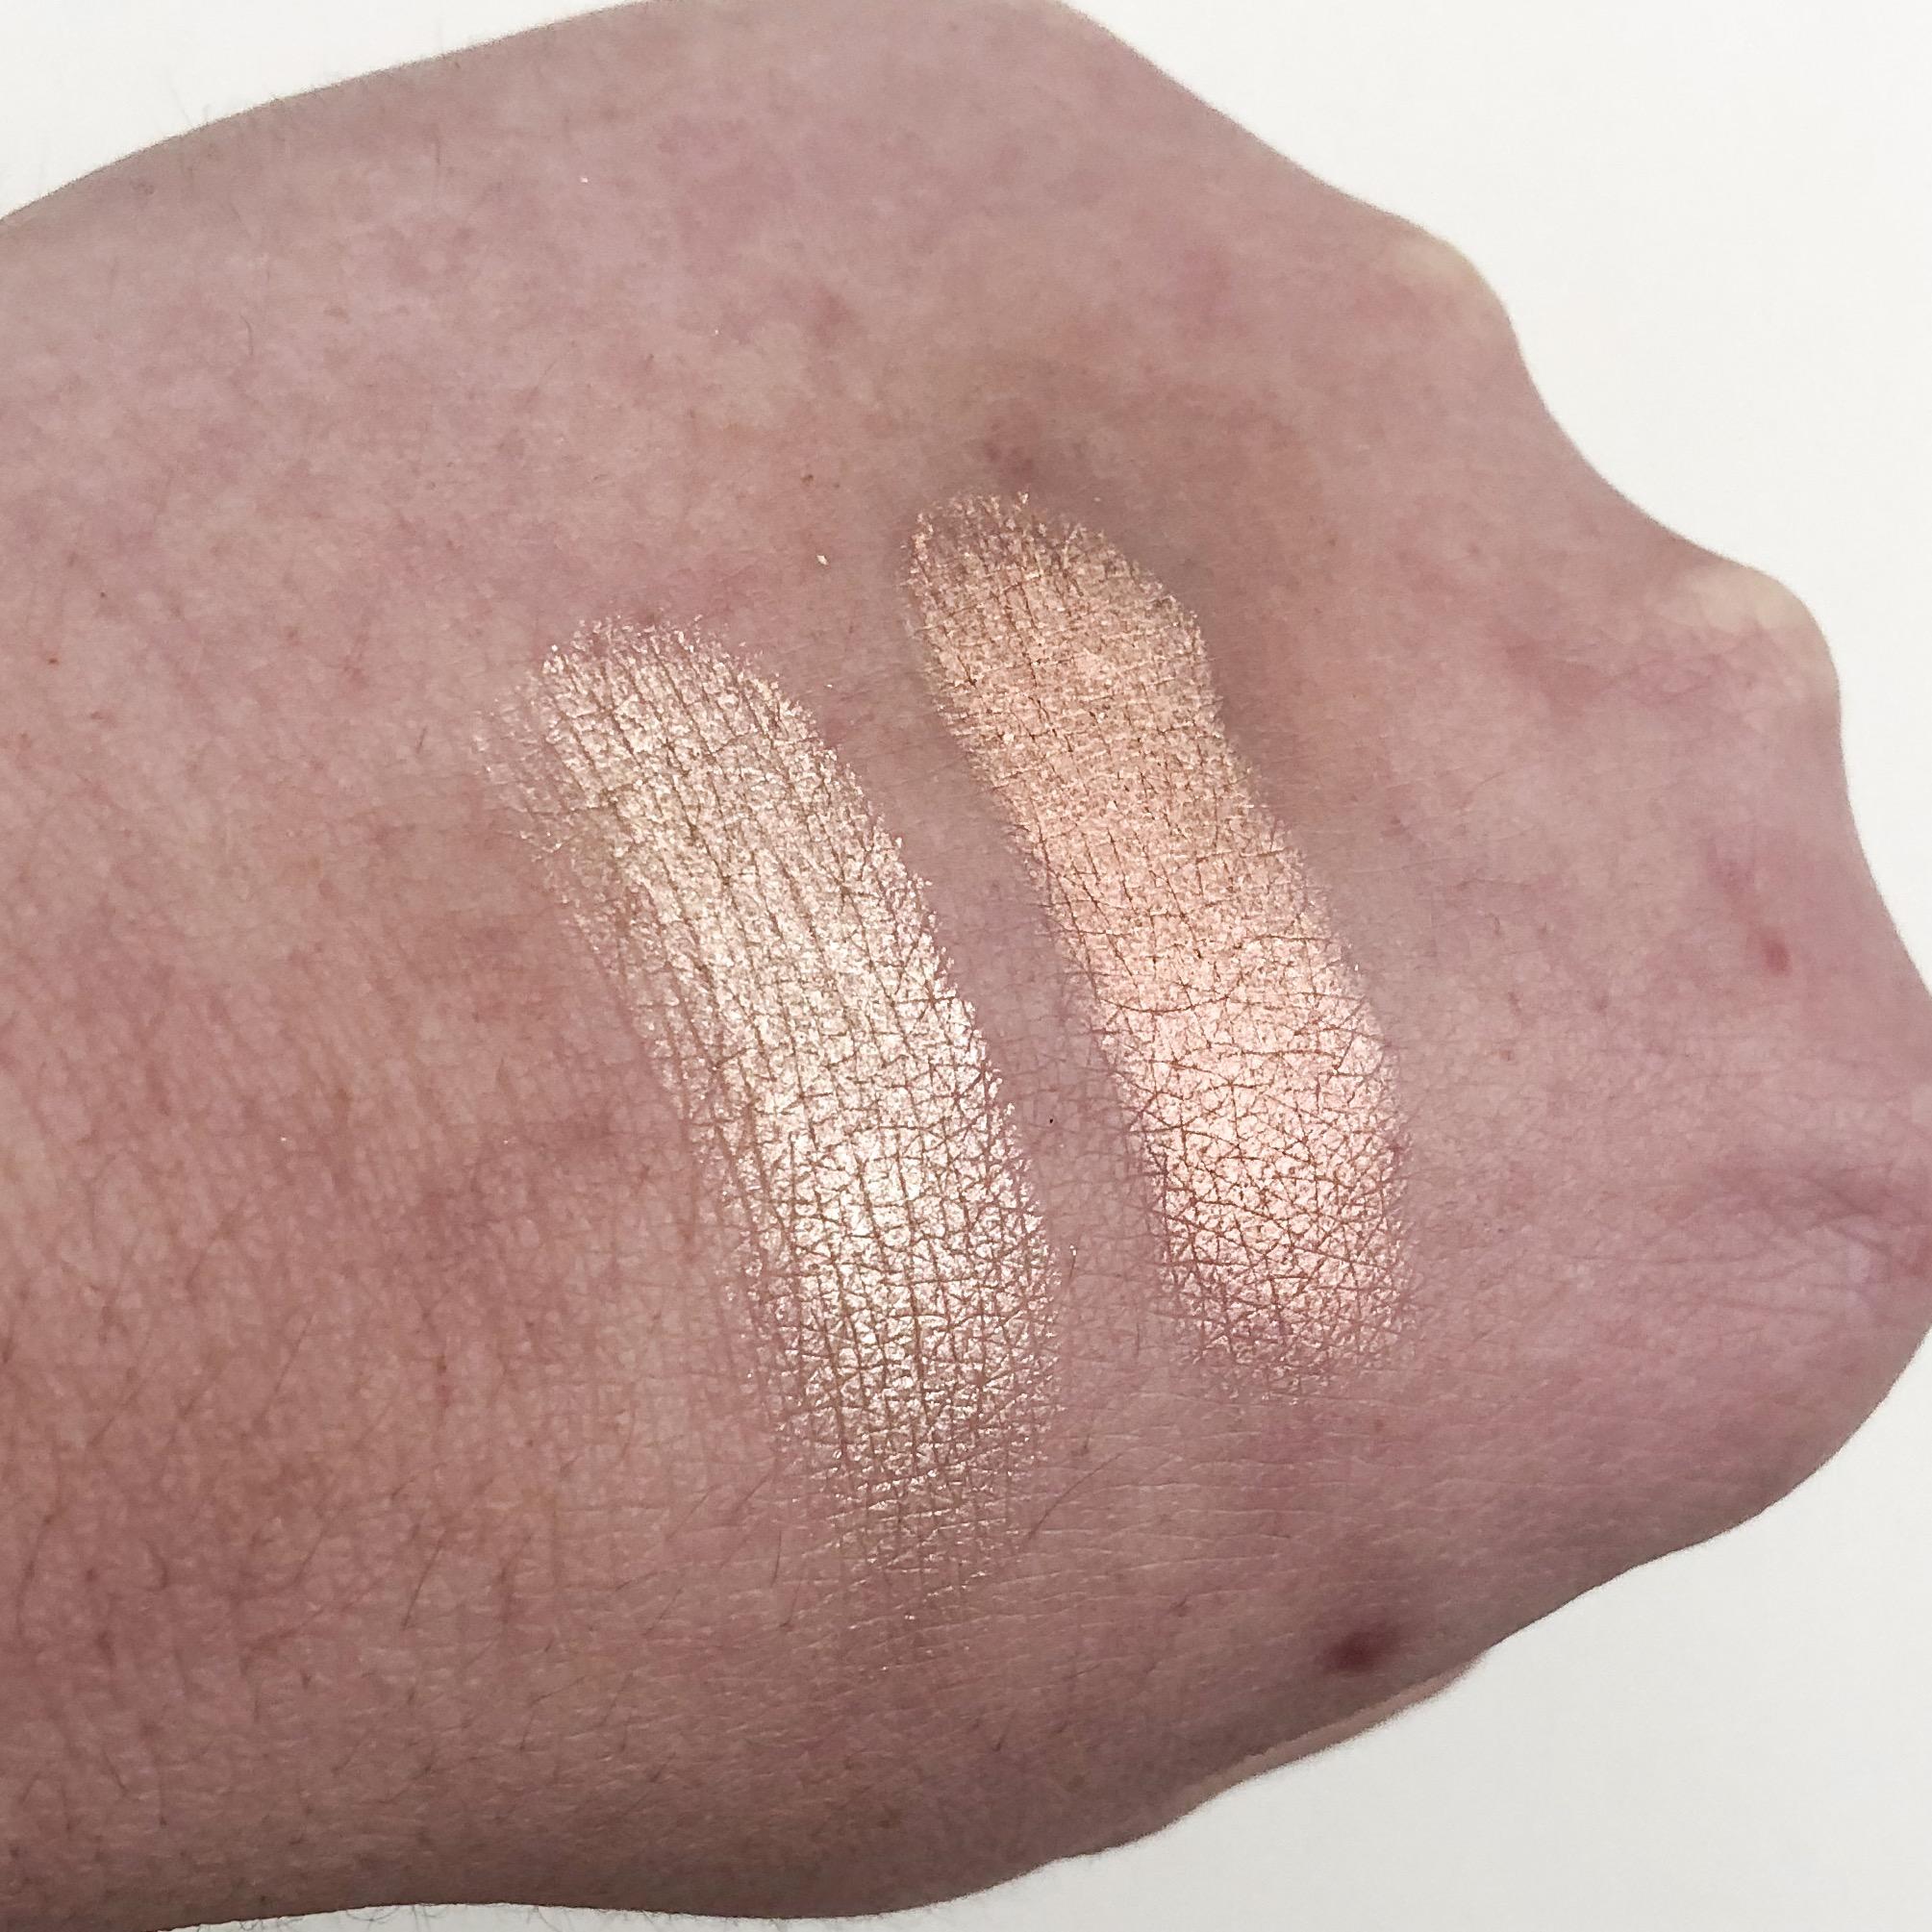 Pixi Beauty Makeup Review Marisa Robinson Beauty